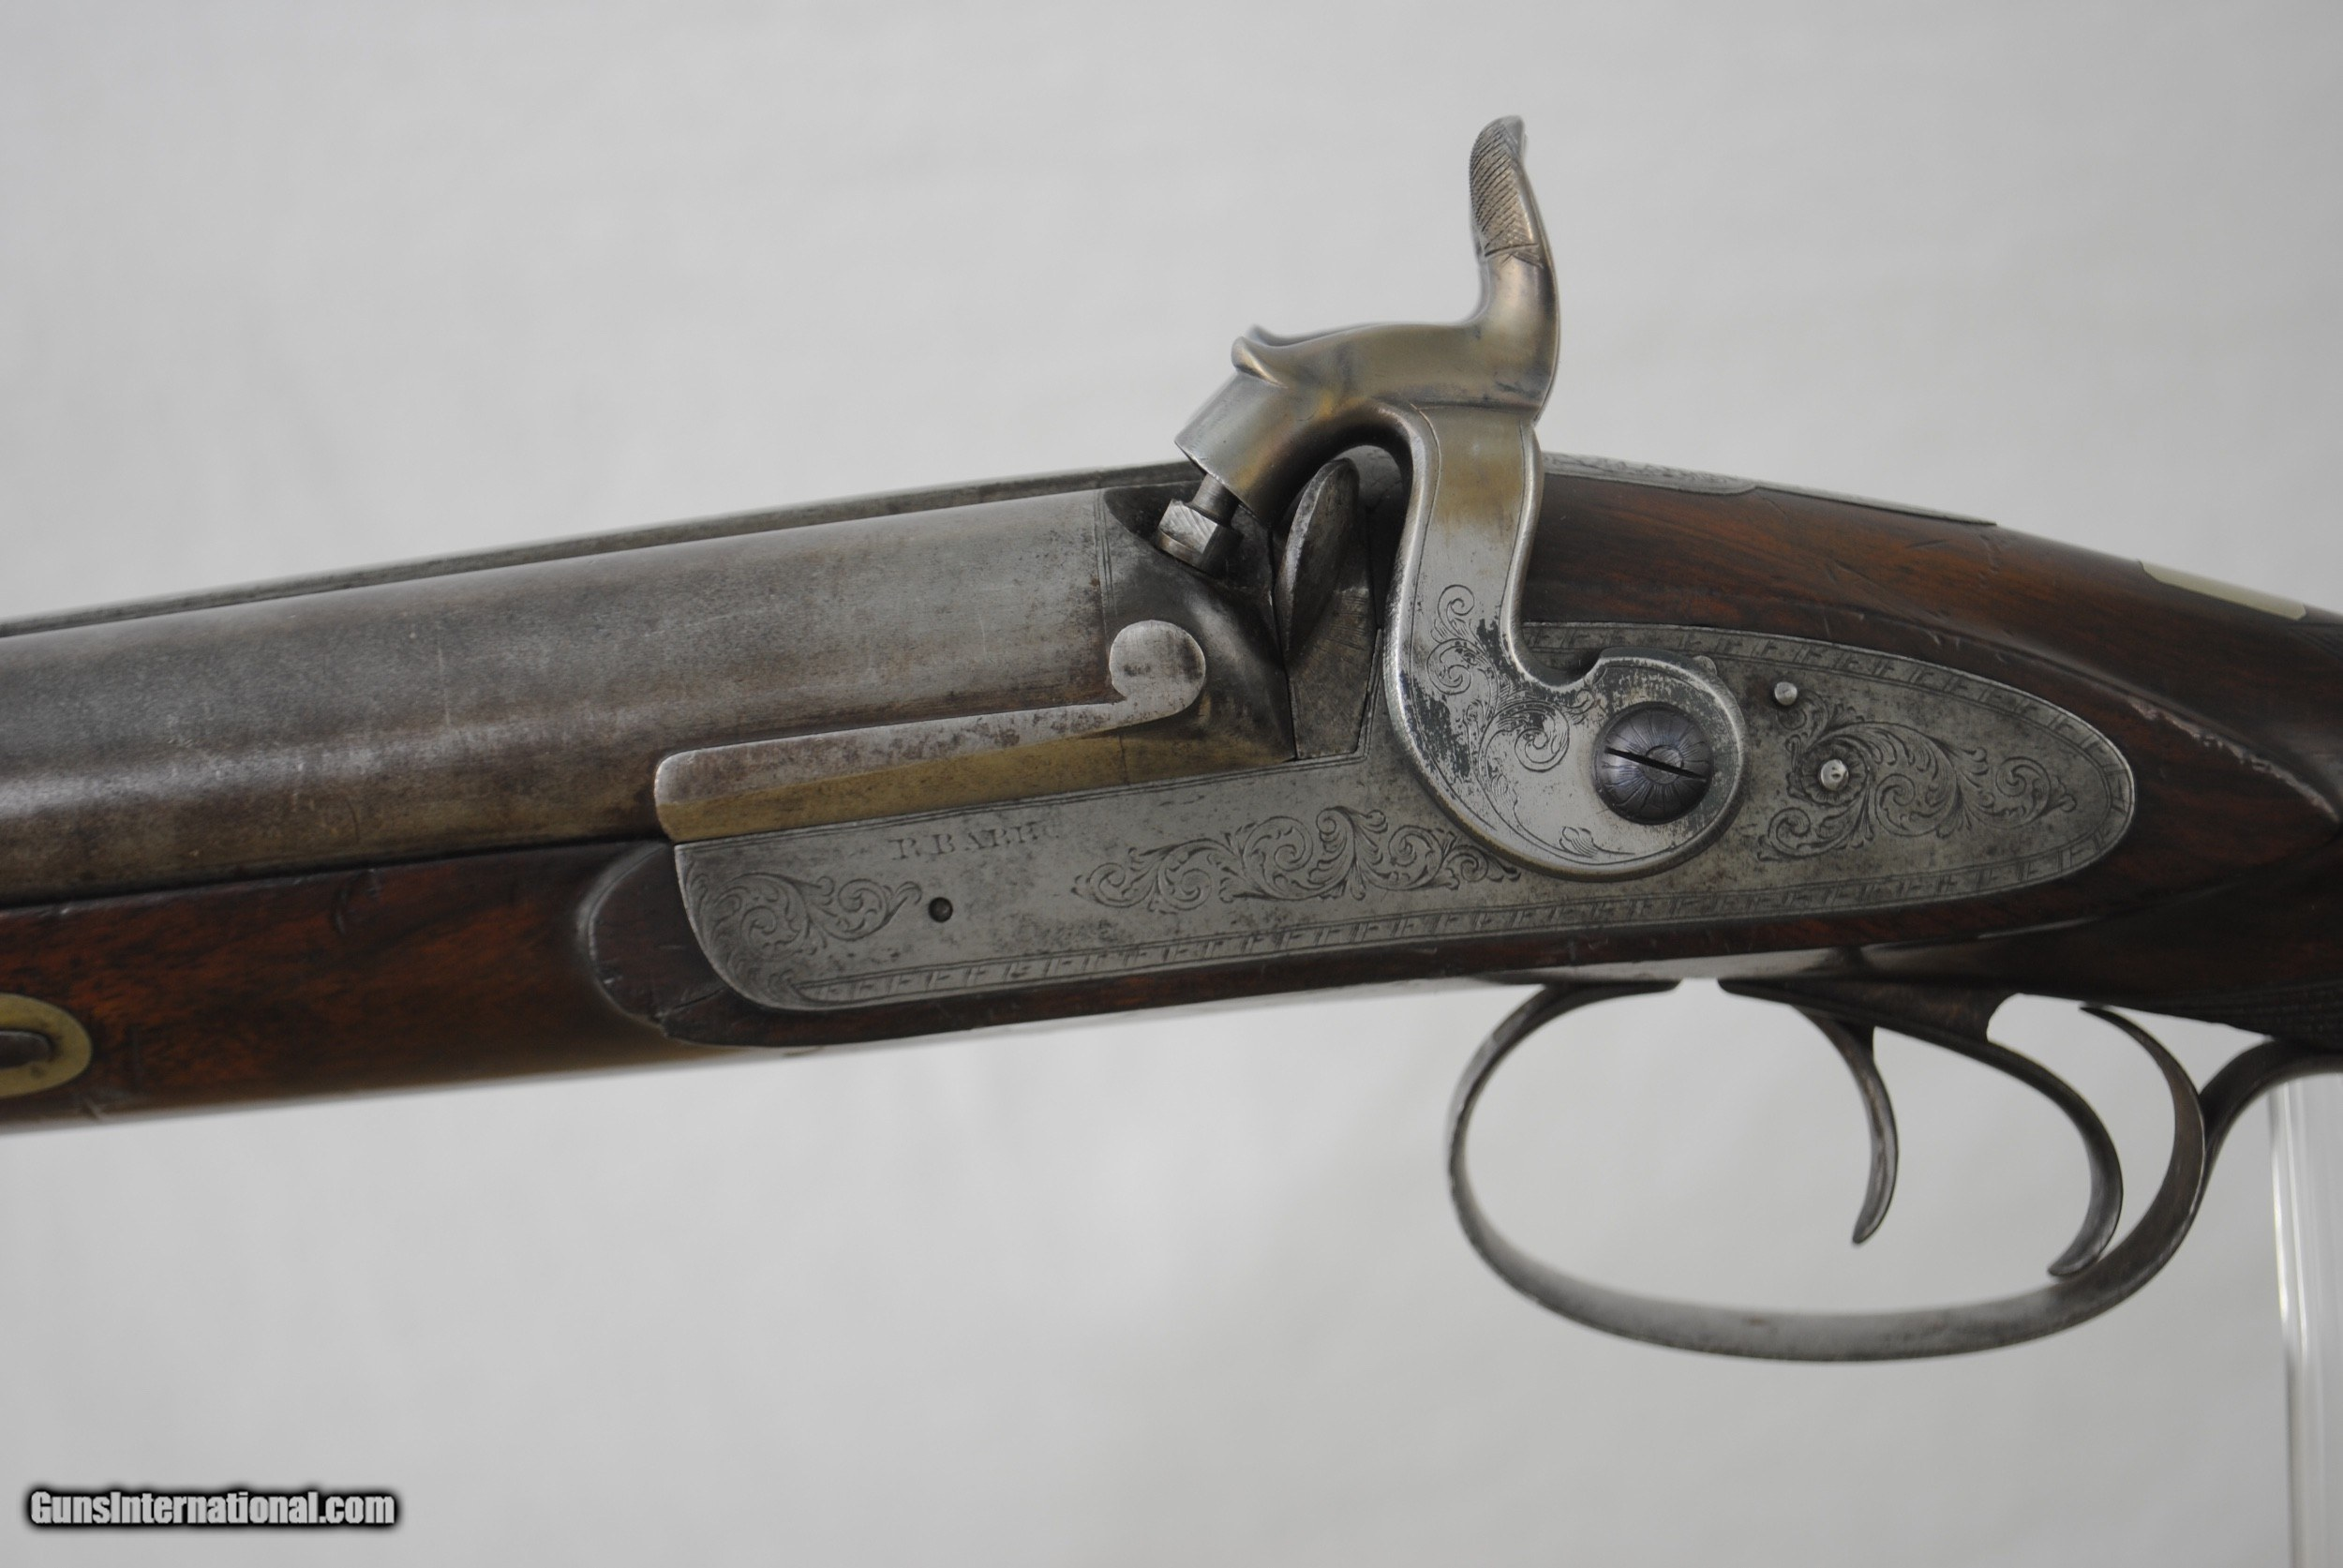 R BARR - NEW YORK - MASSIVE WATERFOWL GUN IN 10 GAUGE WITH 35